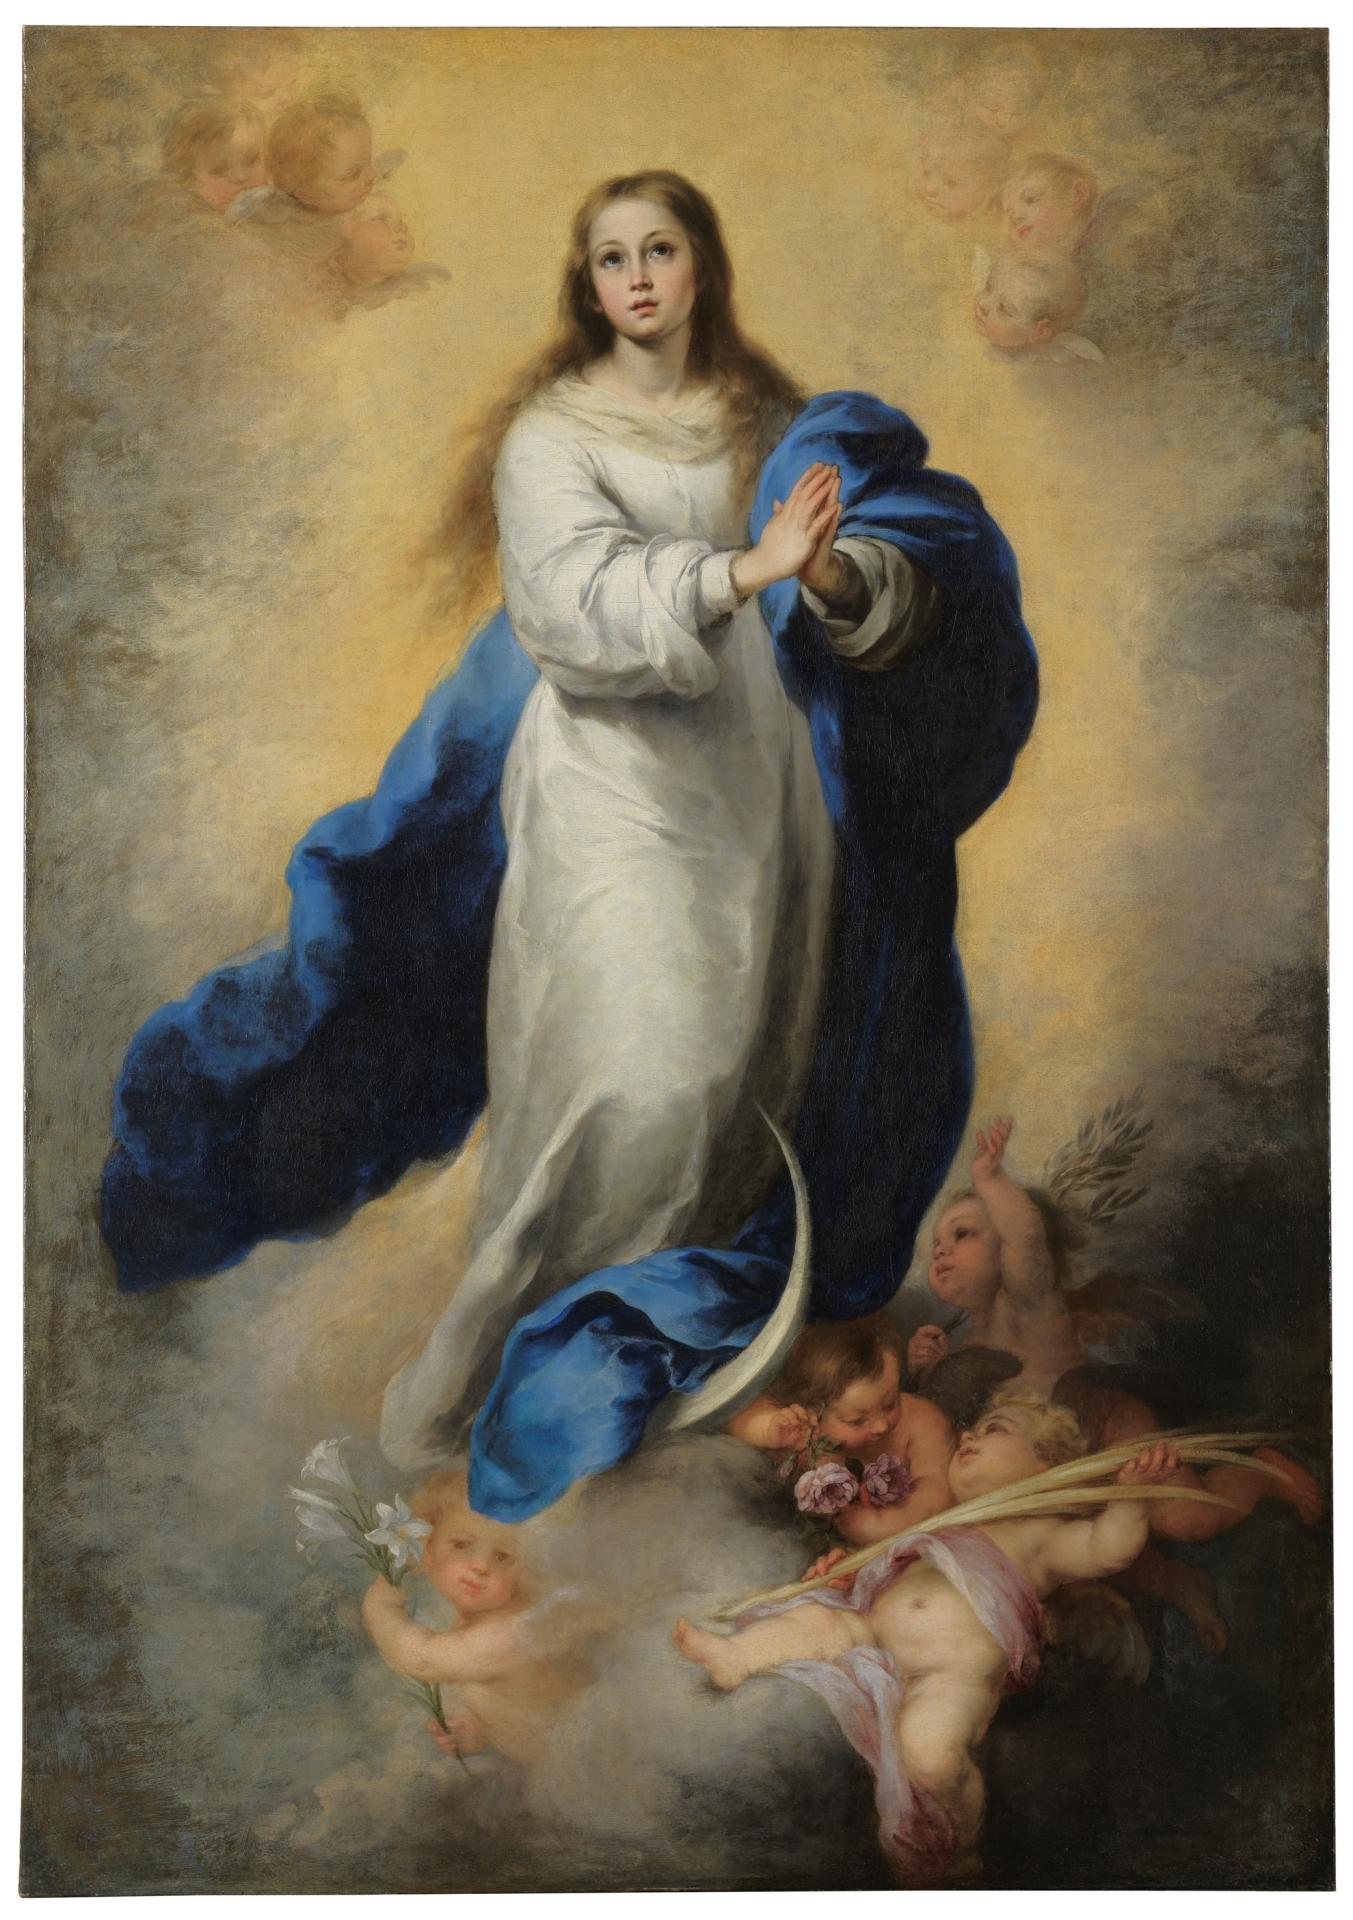 'Inmaculada' de Murillo